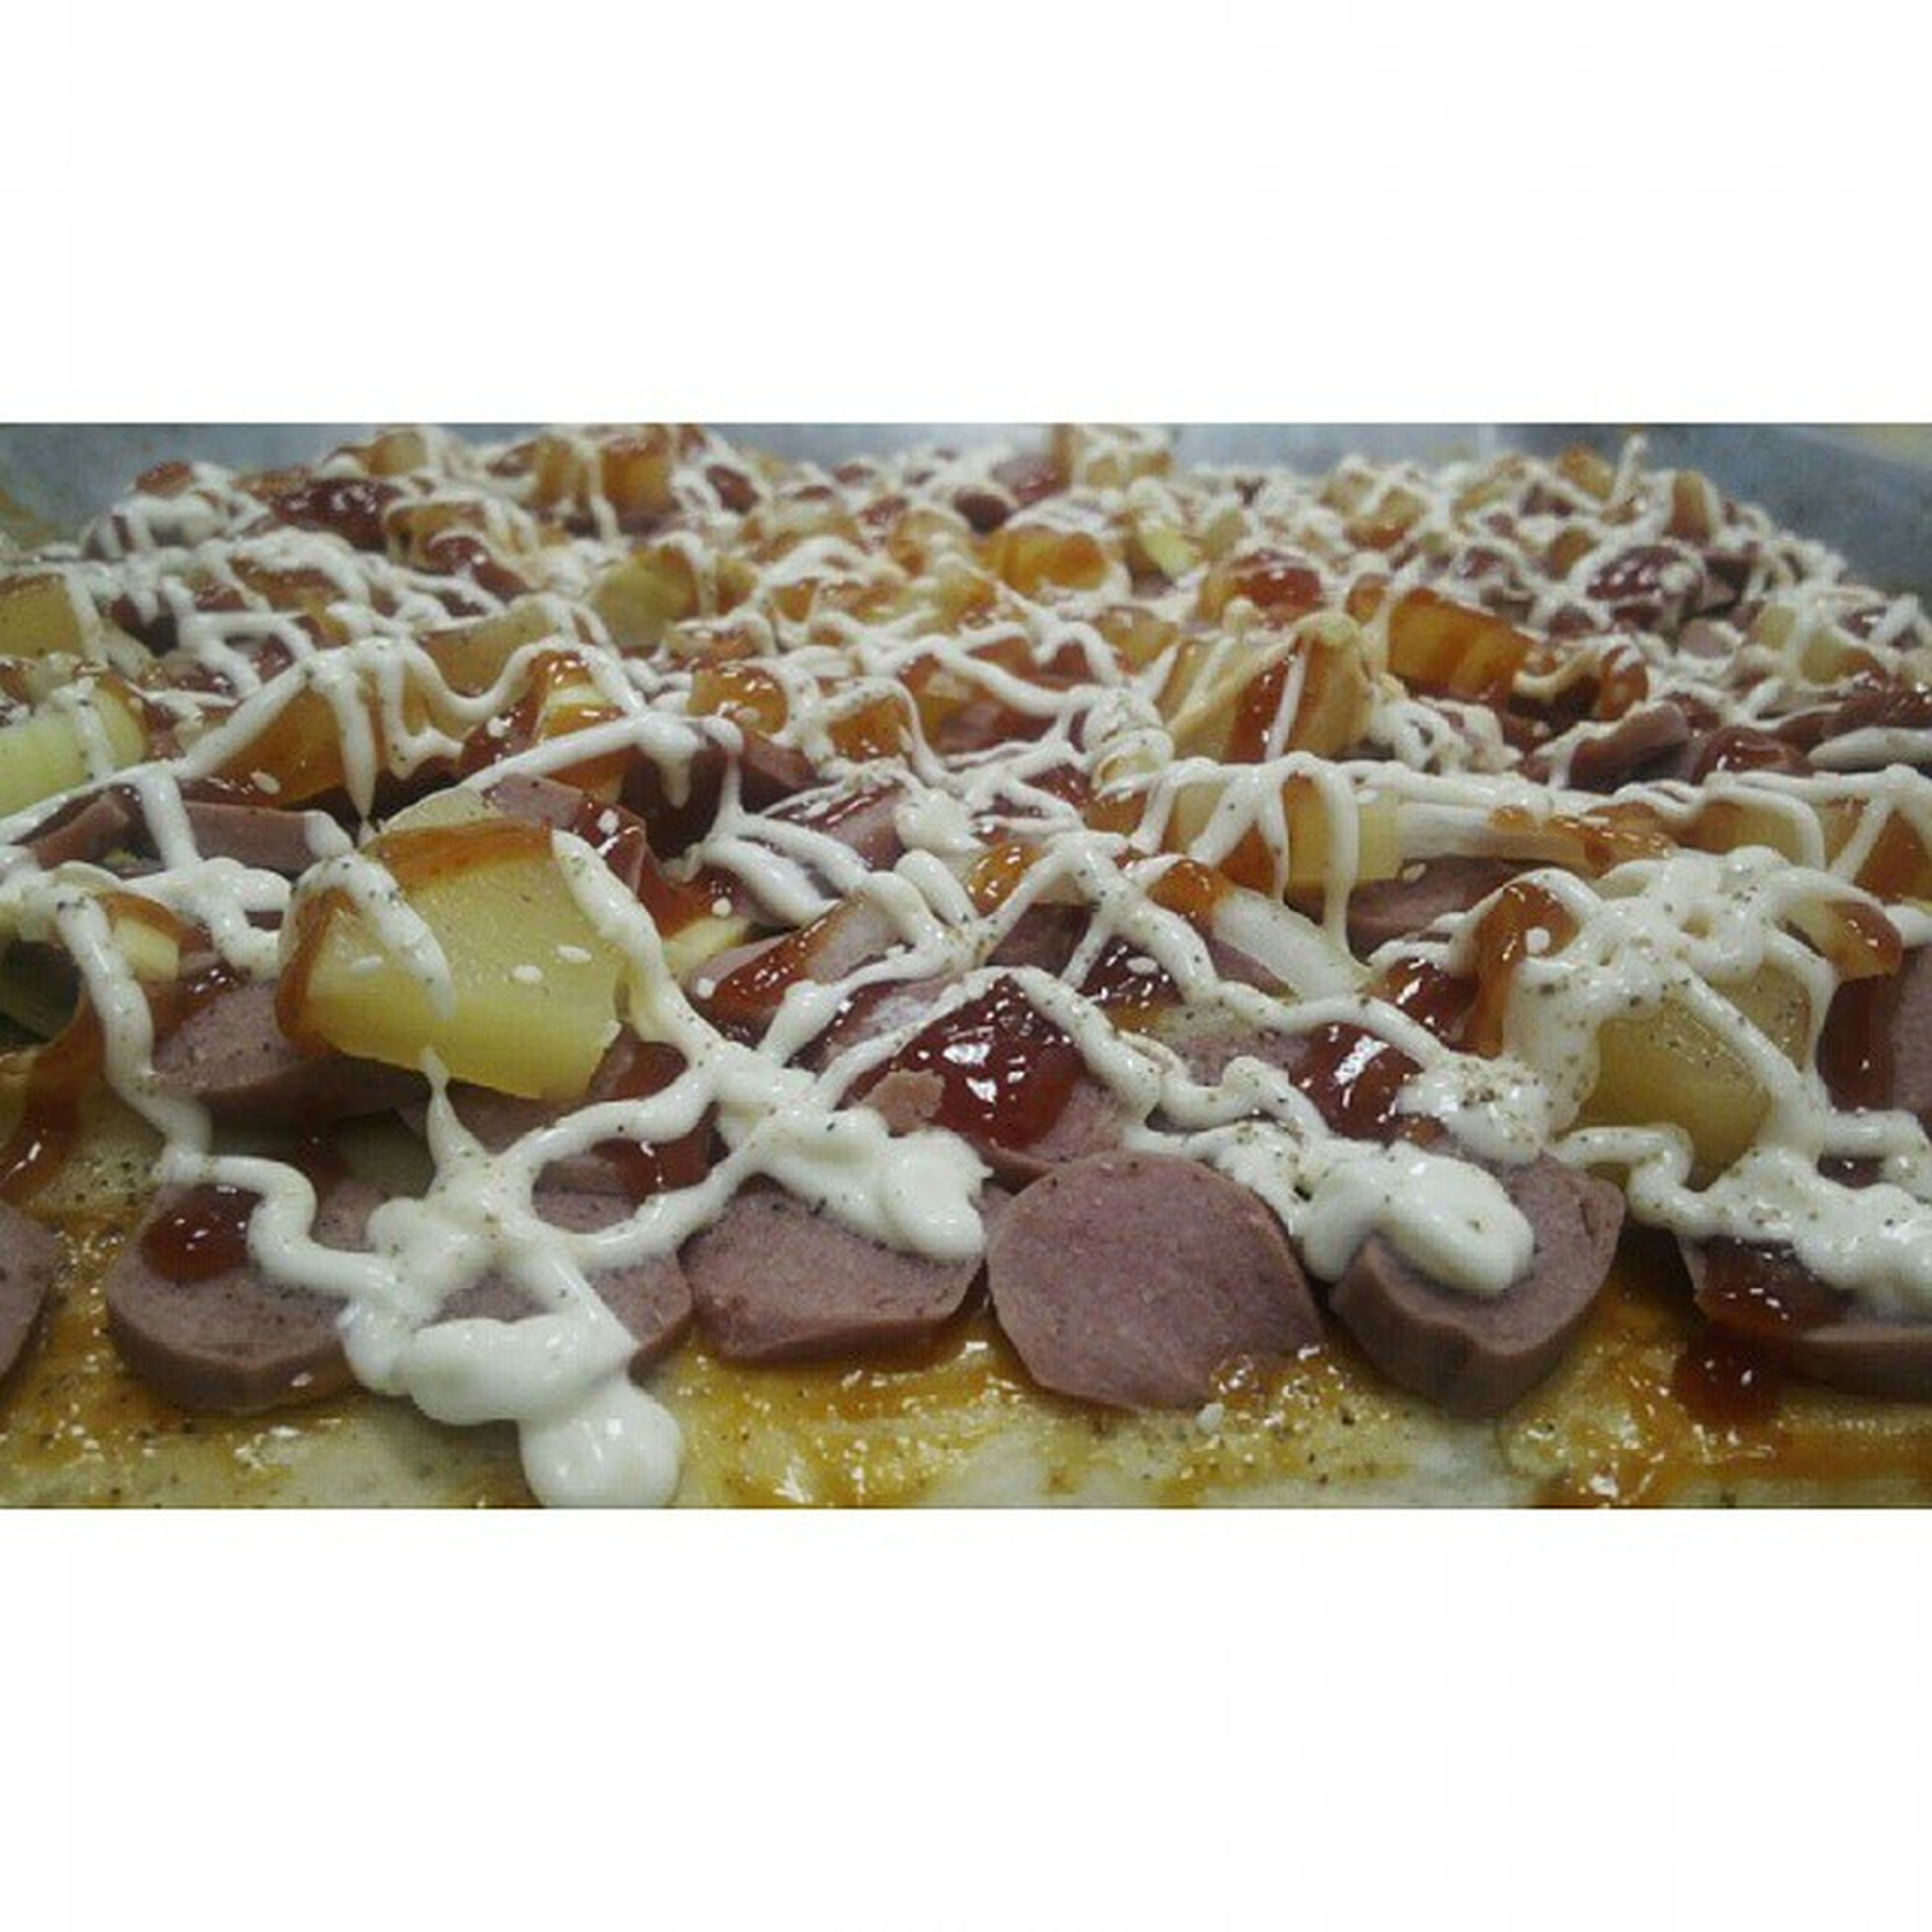 Pizza Ikhwan - - LoveEat BakeryIkhwan Myshoot ChefAkeem